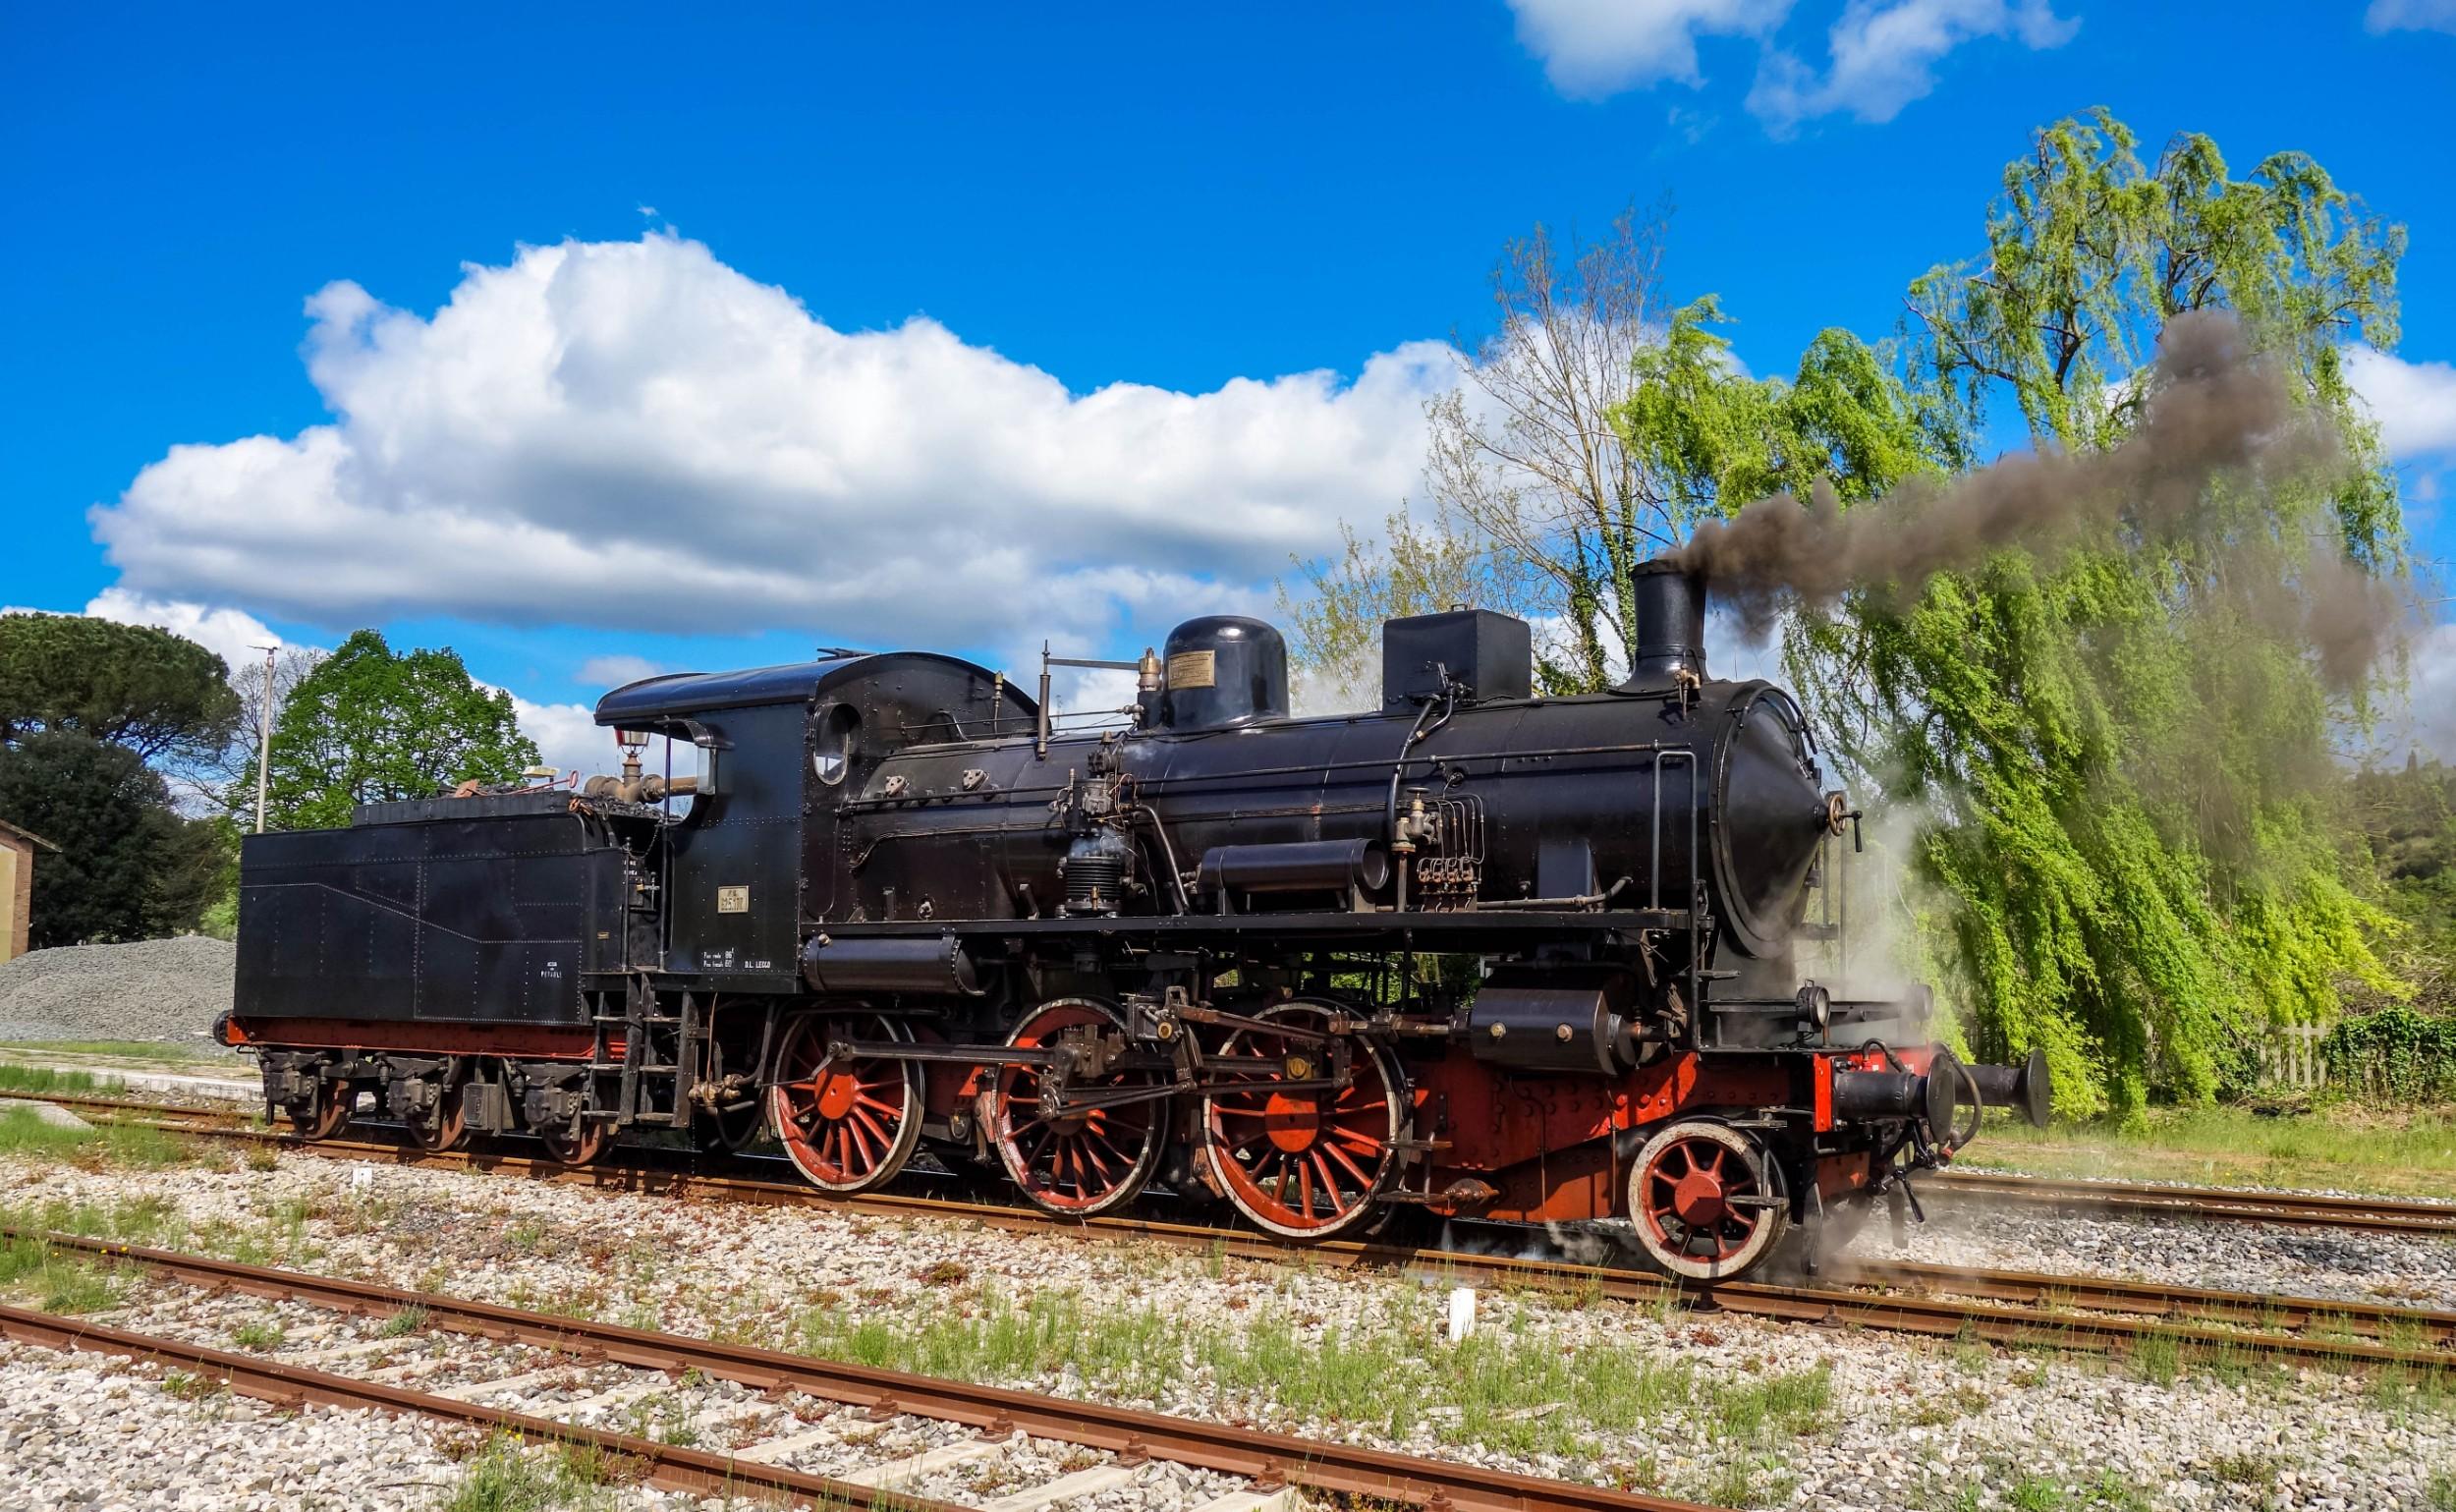 Tuscany Steam